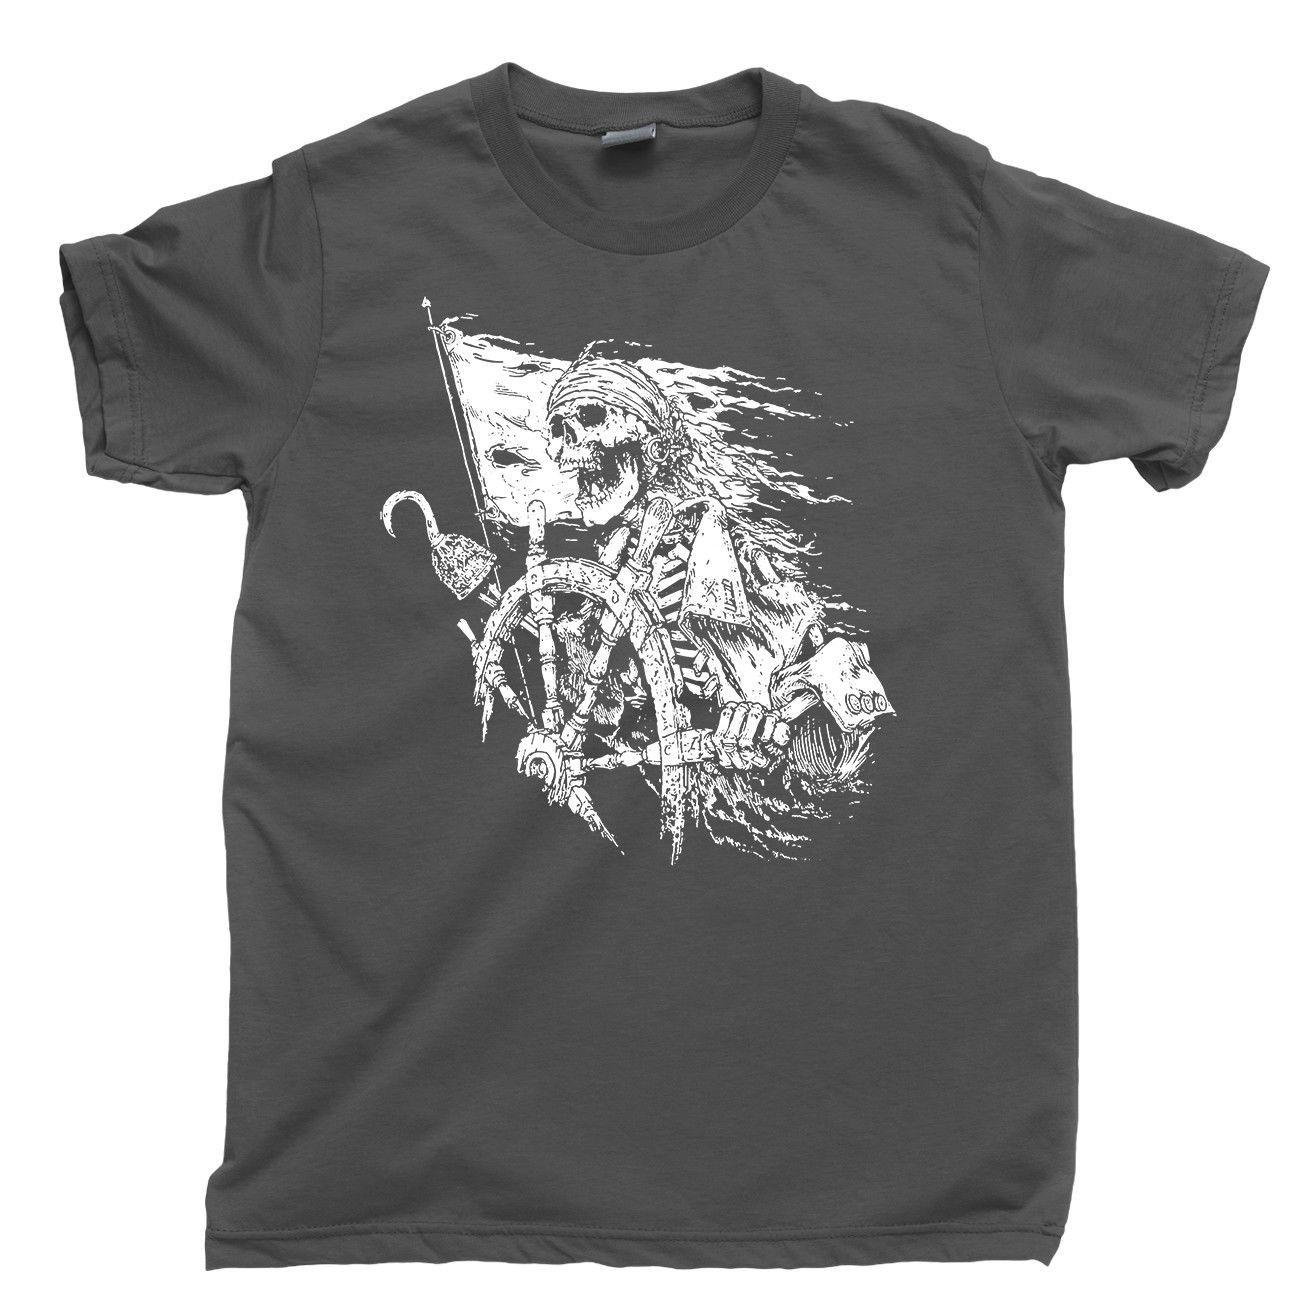 Piraten-Leben-T-Shirt Booty Treasure Island Buccaneer Tattoo Segeln Ozean Meer T